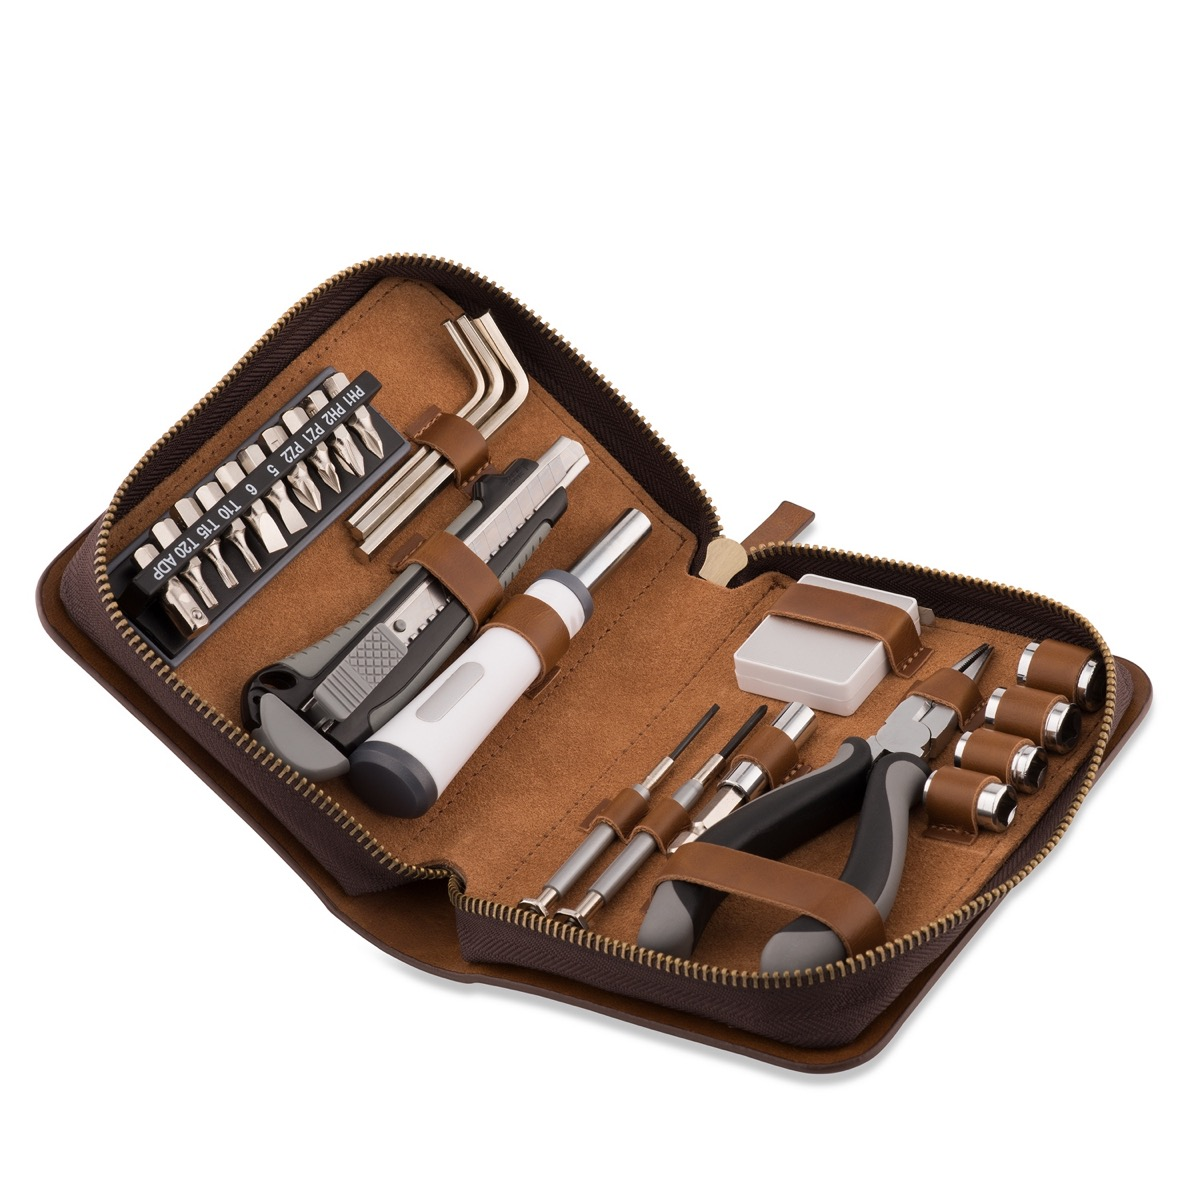 24 piece leather travel tool set